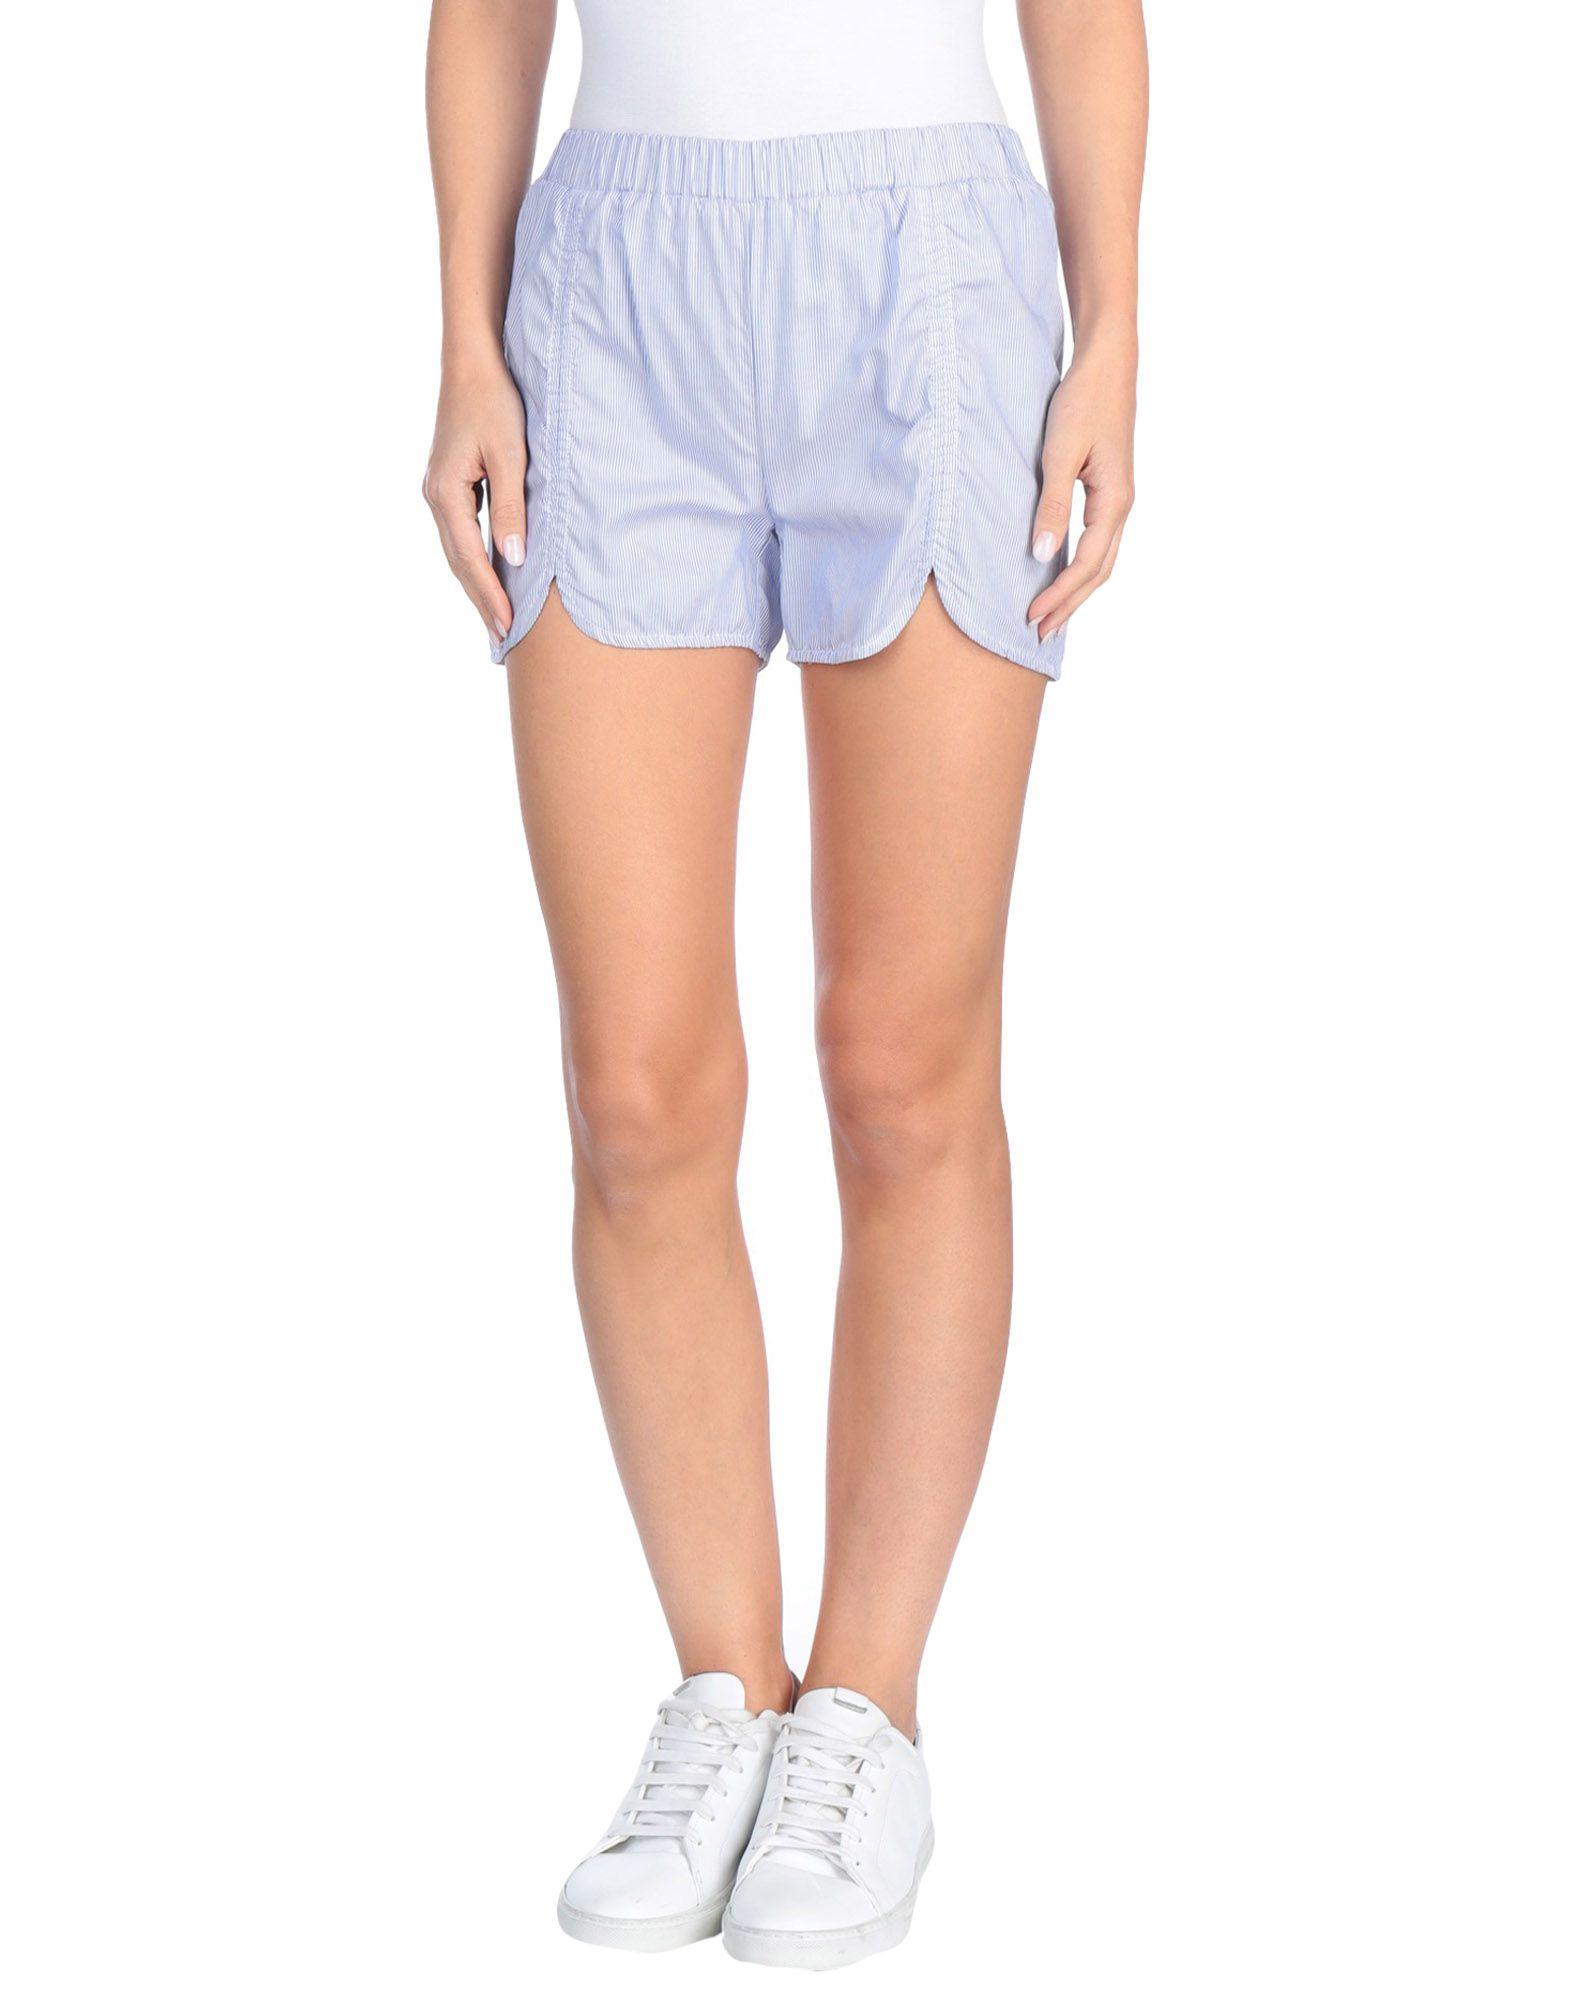 Shorts & & Bermuda Aglini donna - 13255421BW